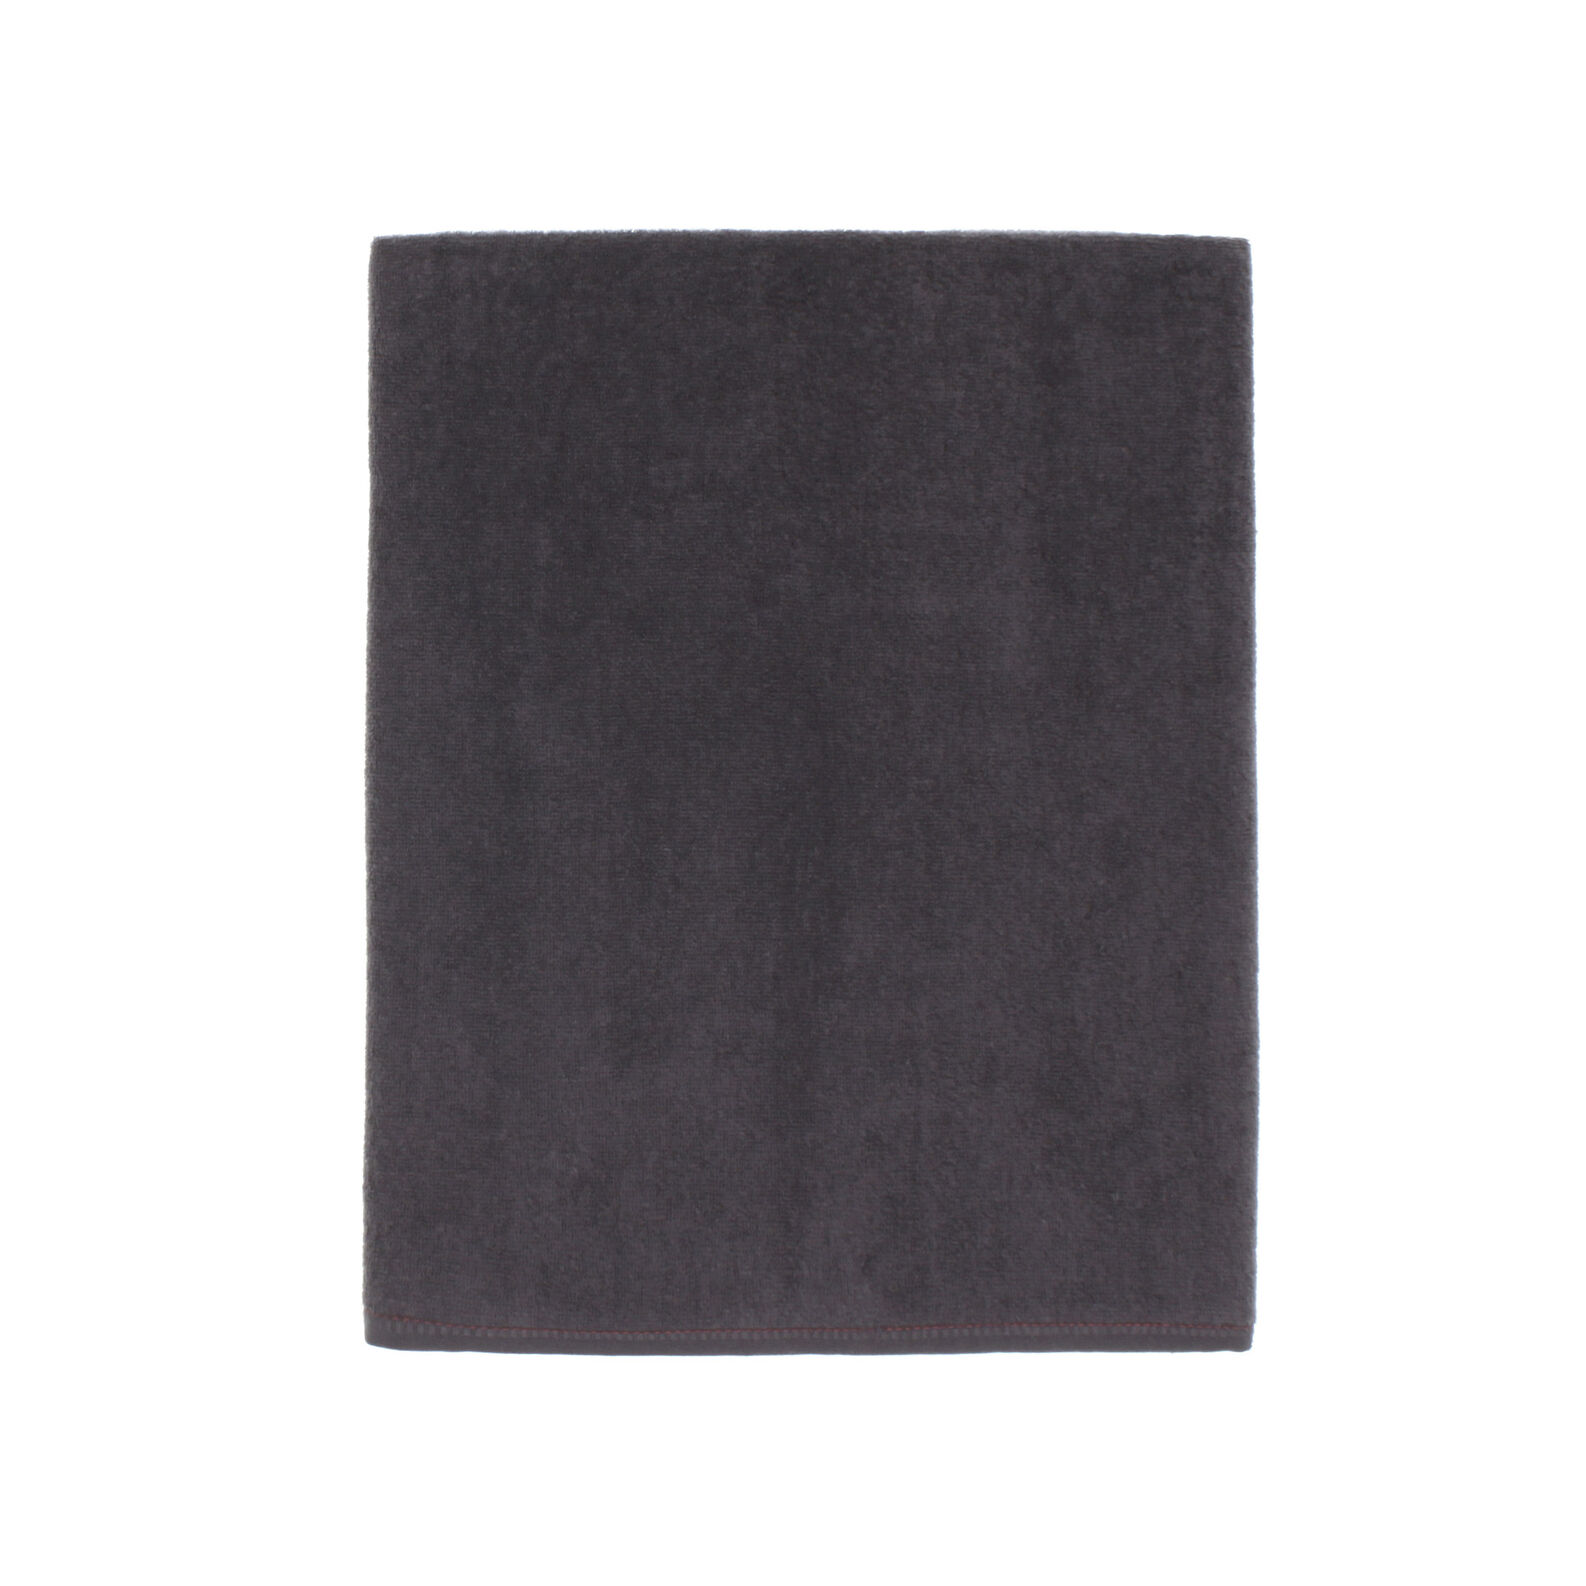 Asciugamano spugna sottile Thermae